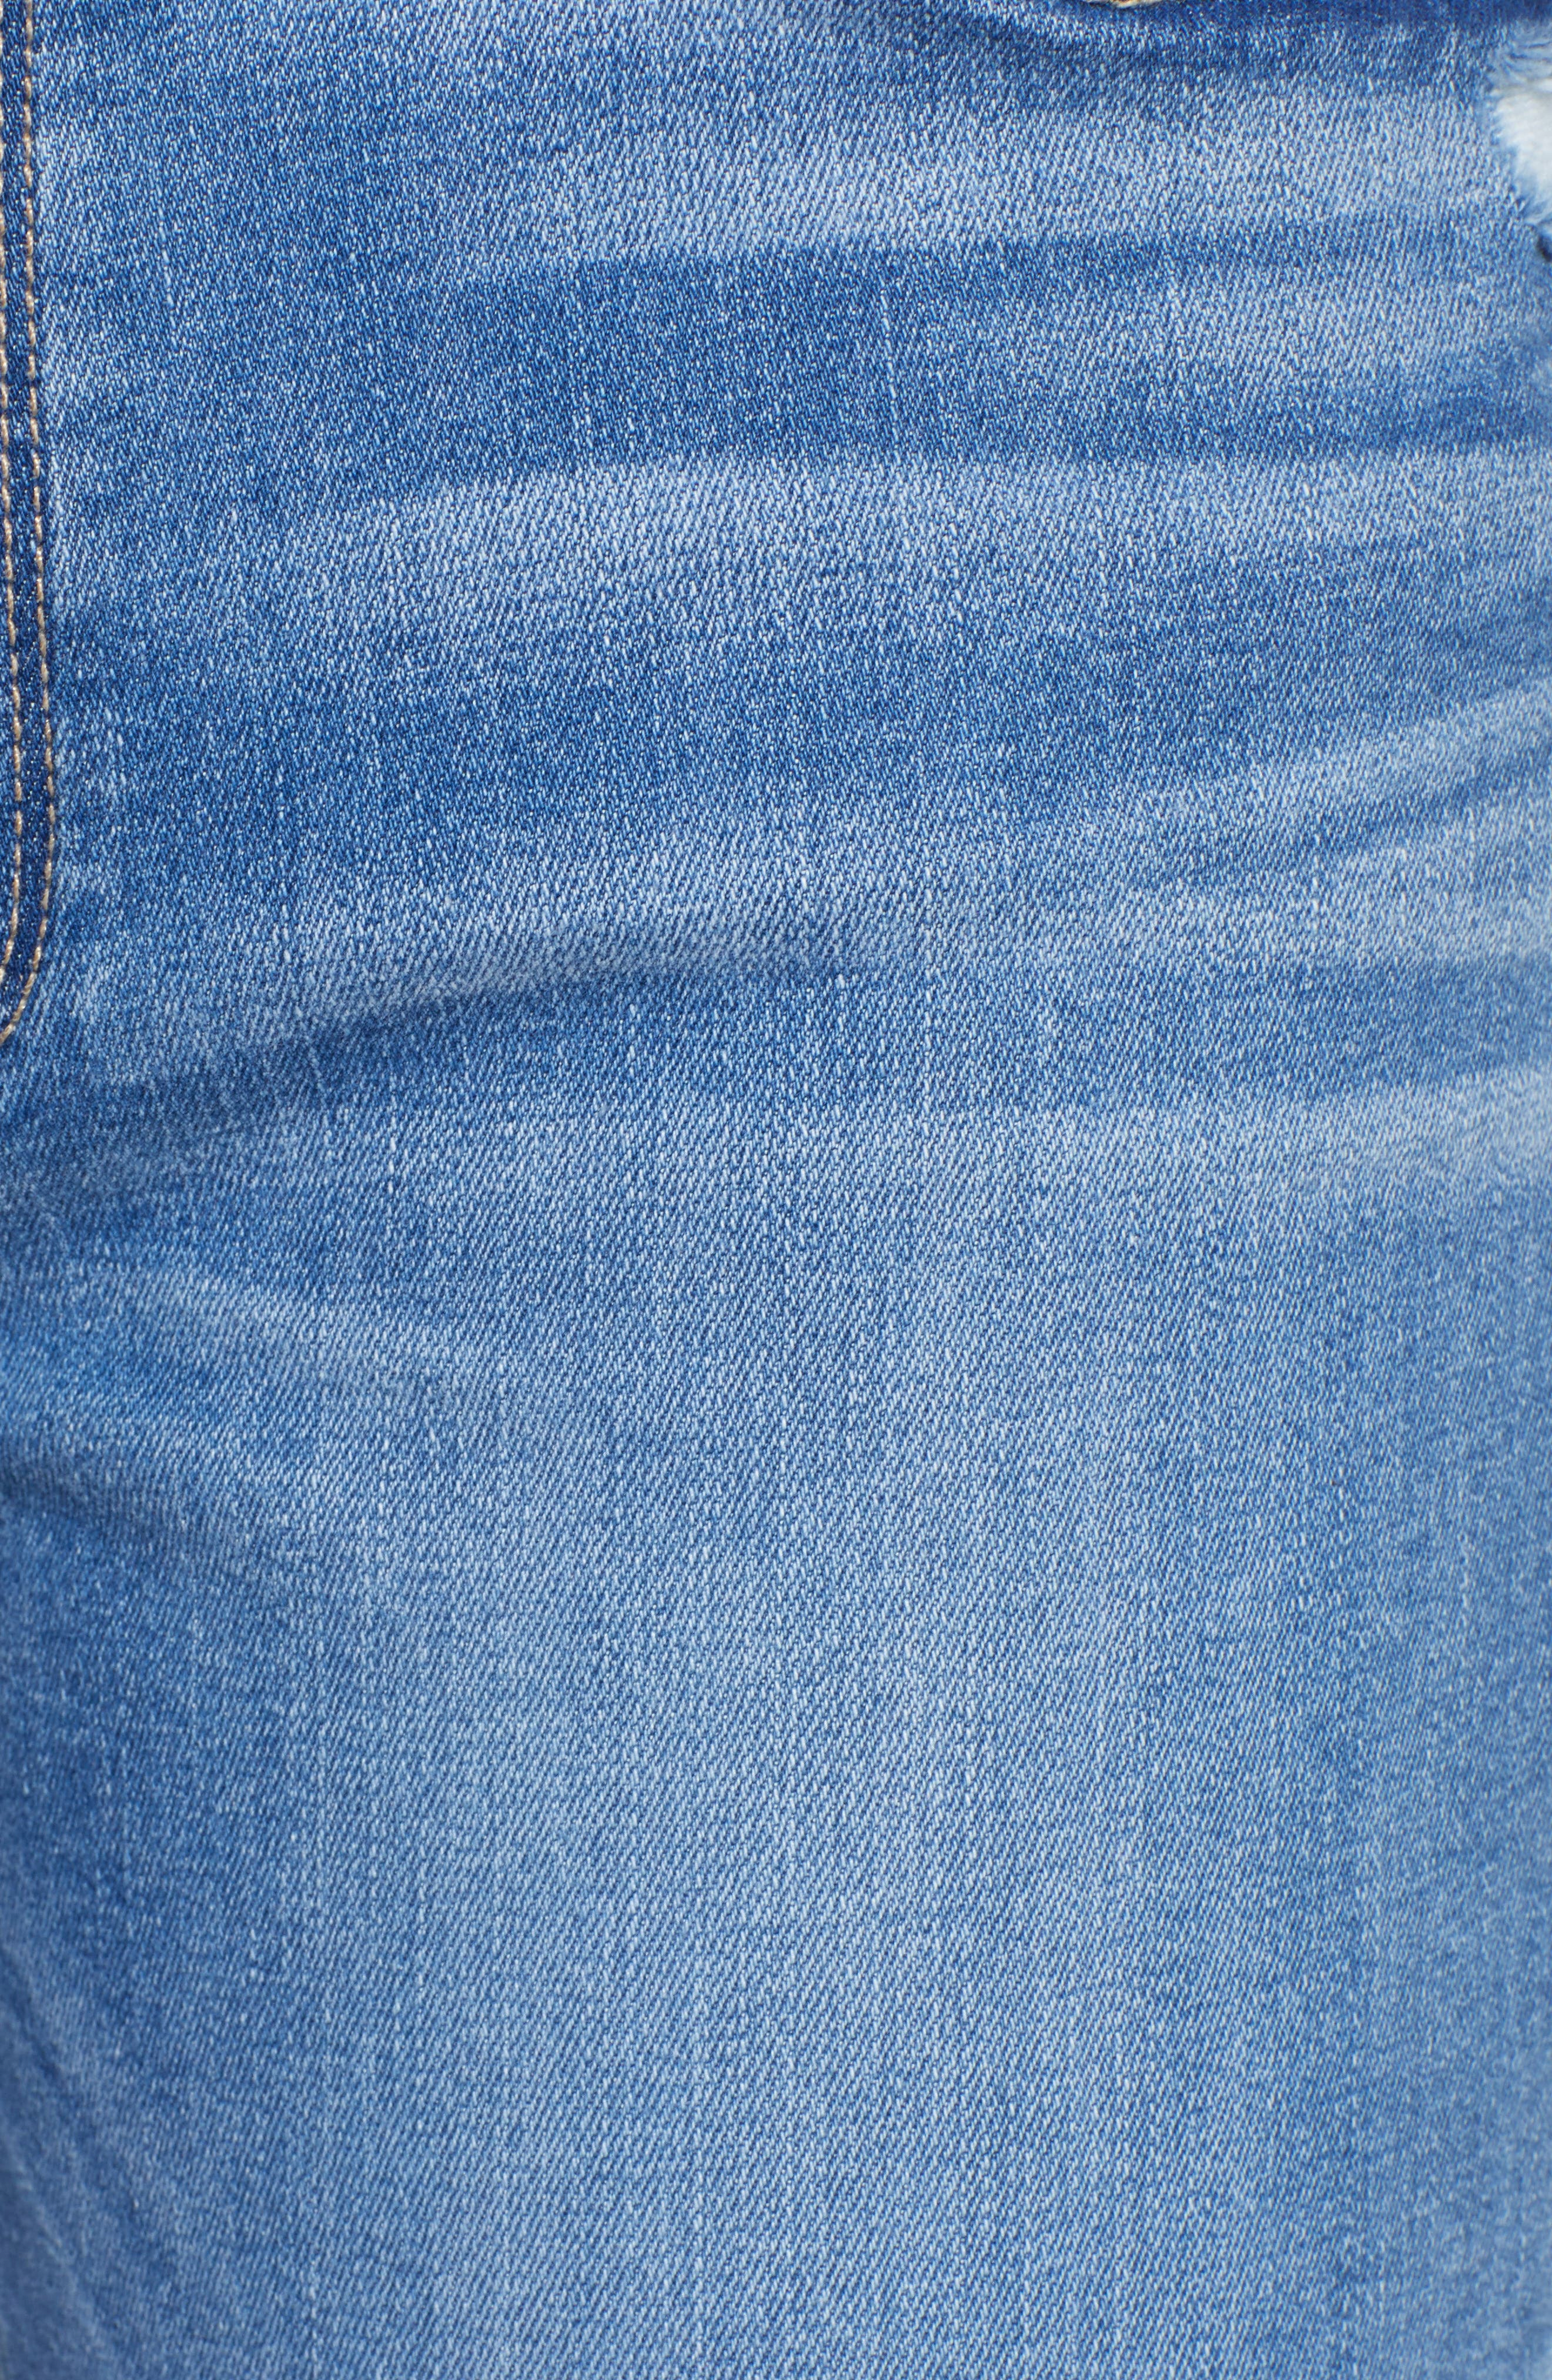 Transcend Vintage - Jimmy Jimmy High Waist Crop Boyfriend Jeans,                             Alternate thumbnail 6, color,                             Vintage Venice